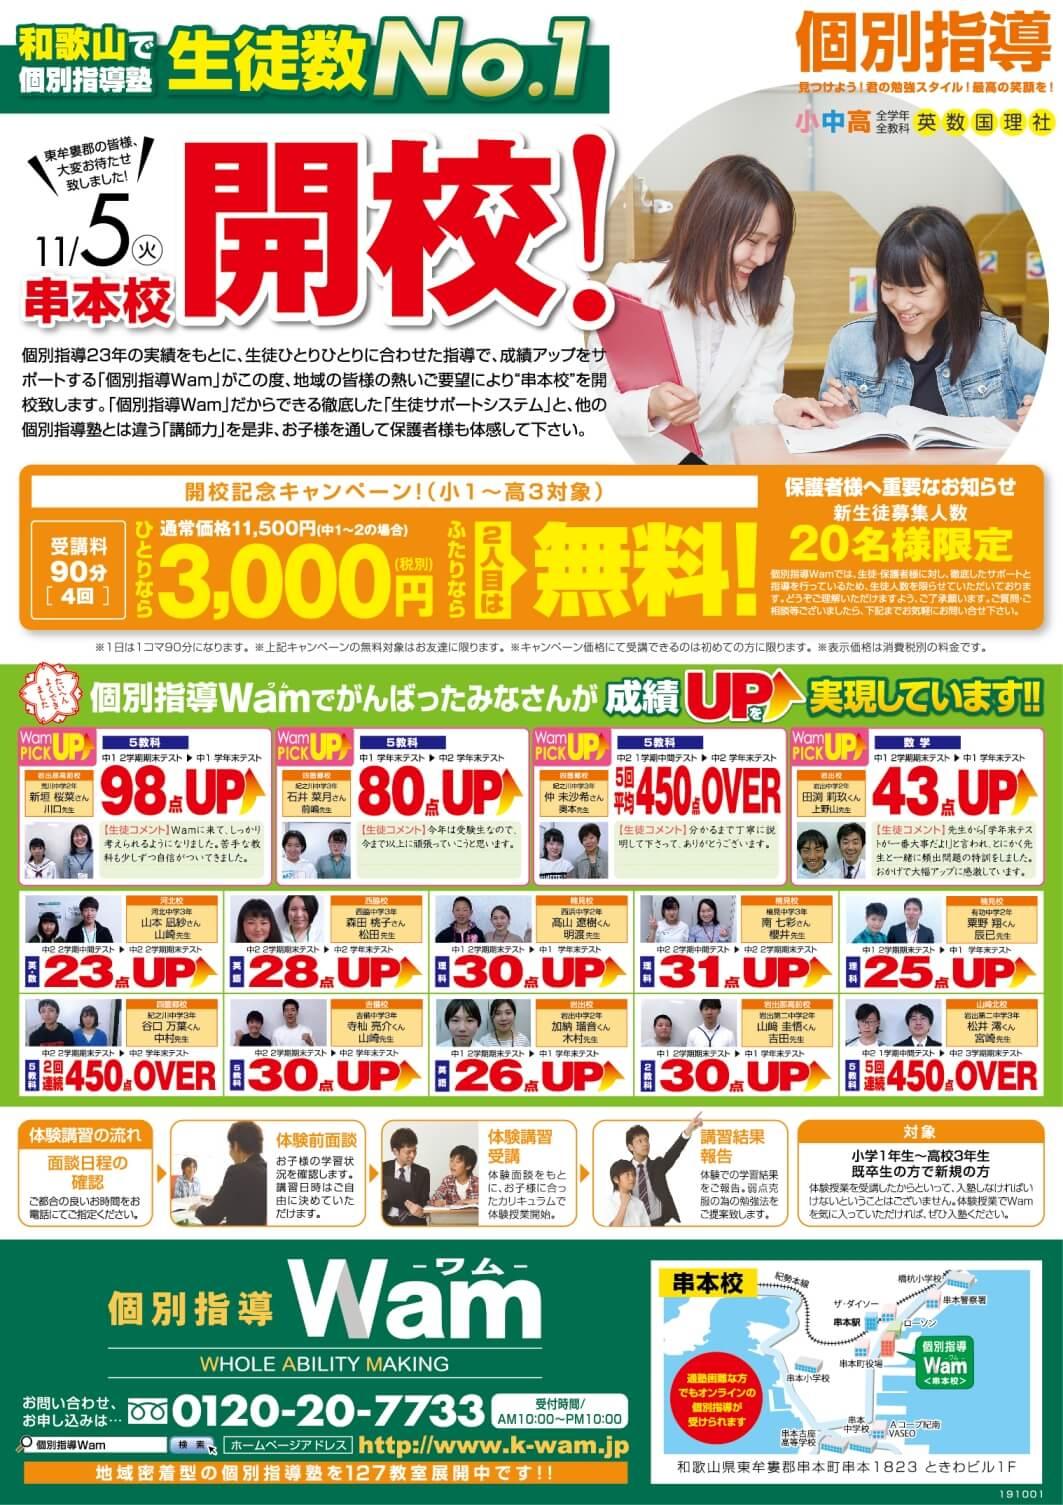 串本校 2019年11月5日(火) 開校・オモテ面